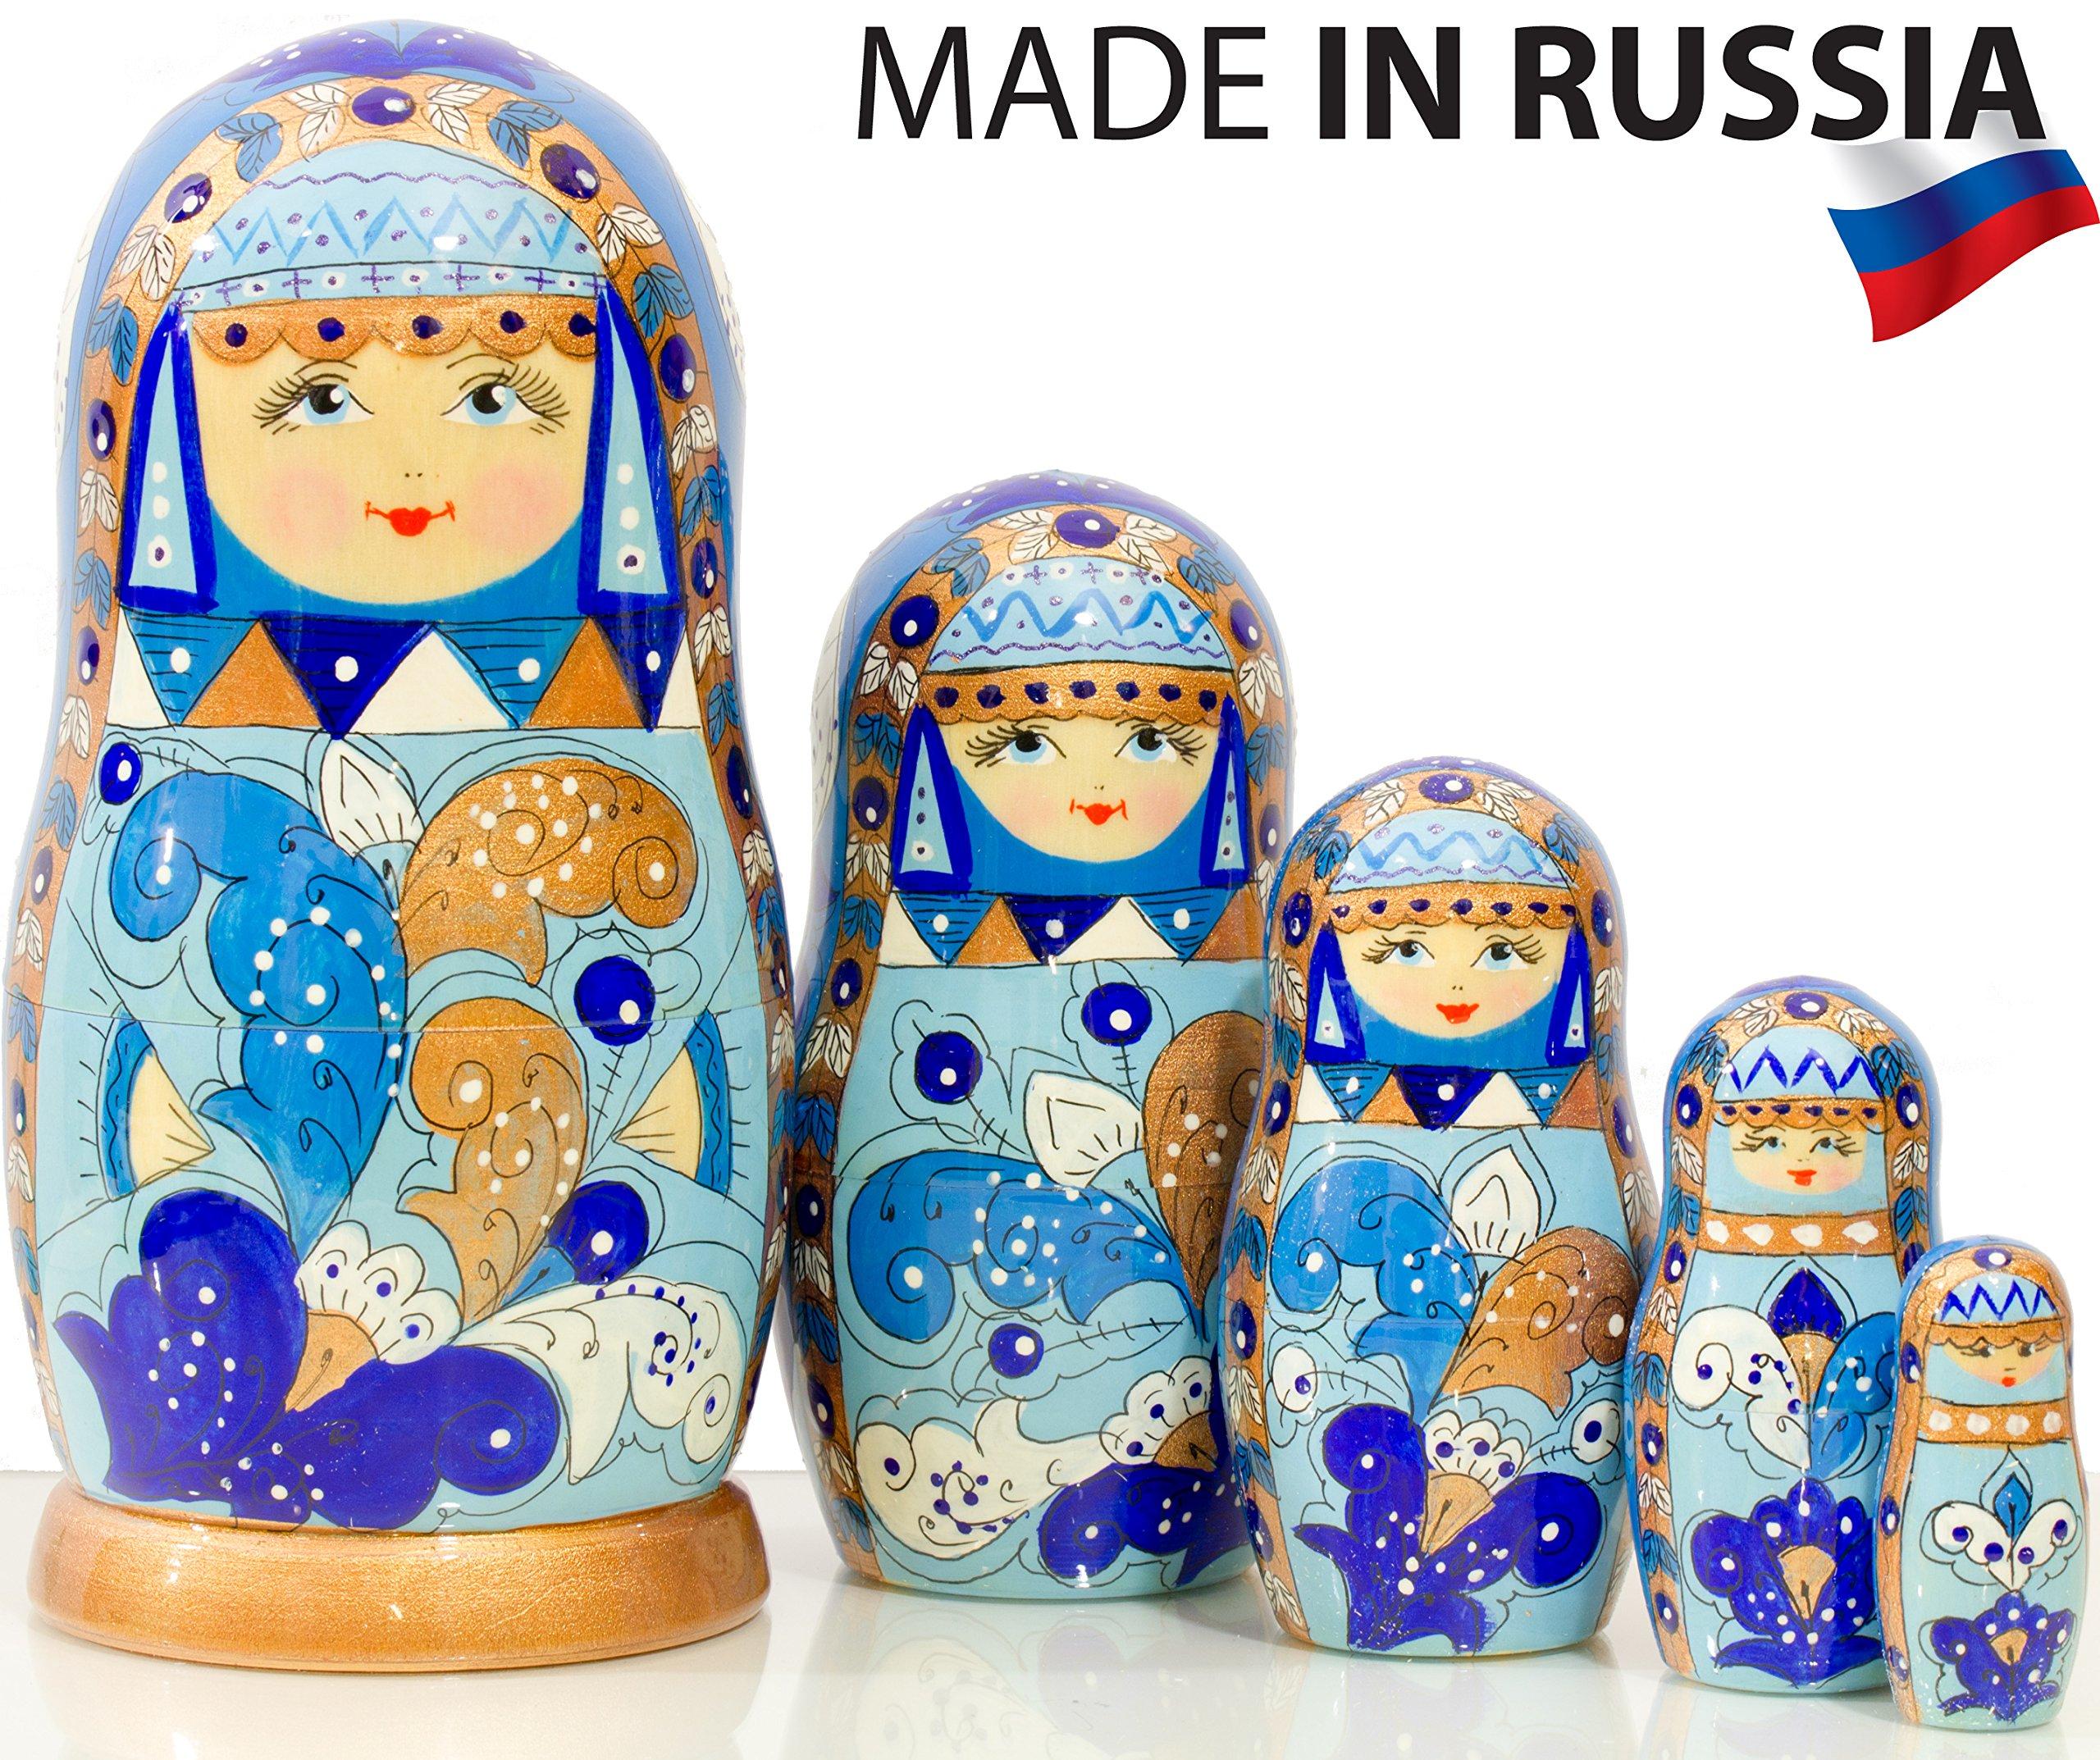 Russian Nesting Doll - Snow Queen - Hand Painted in Russia - Medium Size - Traditional Matryoshka Babushka (6.75`` (5 Dolls in 1), Blue) (6.75`` (5 Dolls in 1), Gzhel)